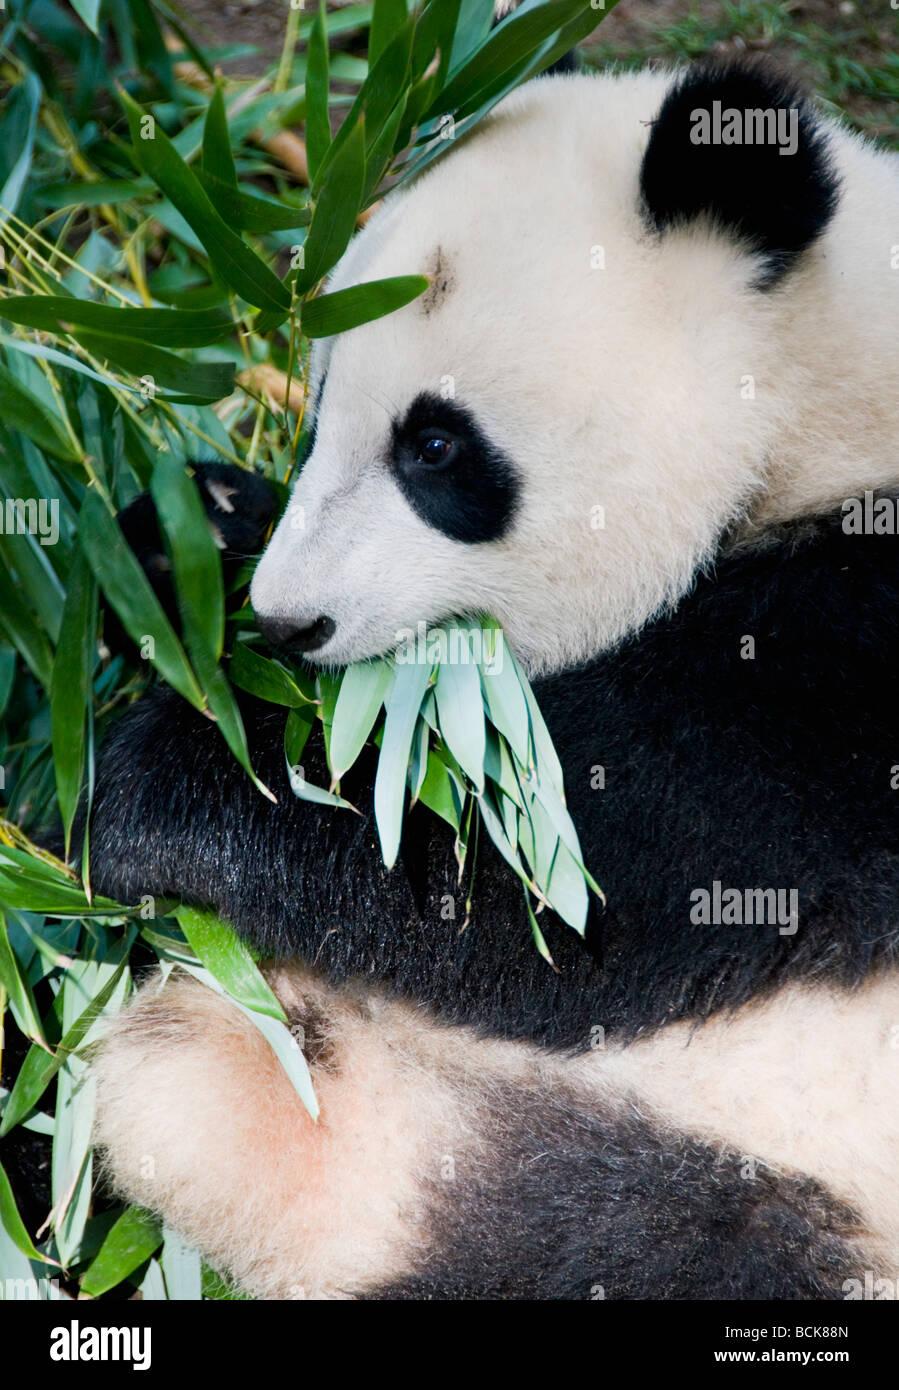 Panda géant (Ailuropoda melanoleuca) alimentation, Zoo de San Diego Photo Stock